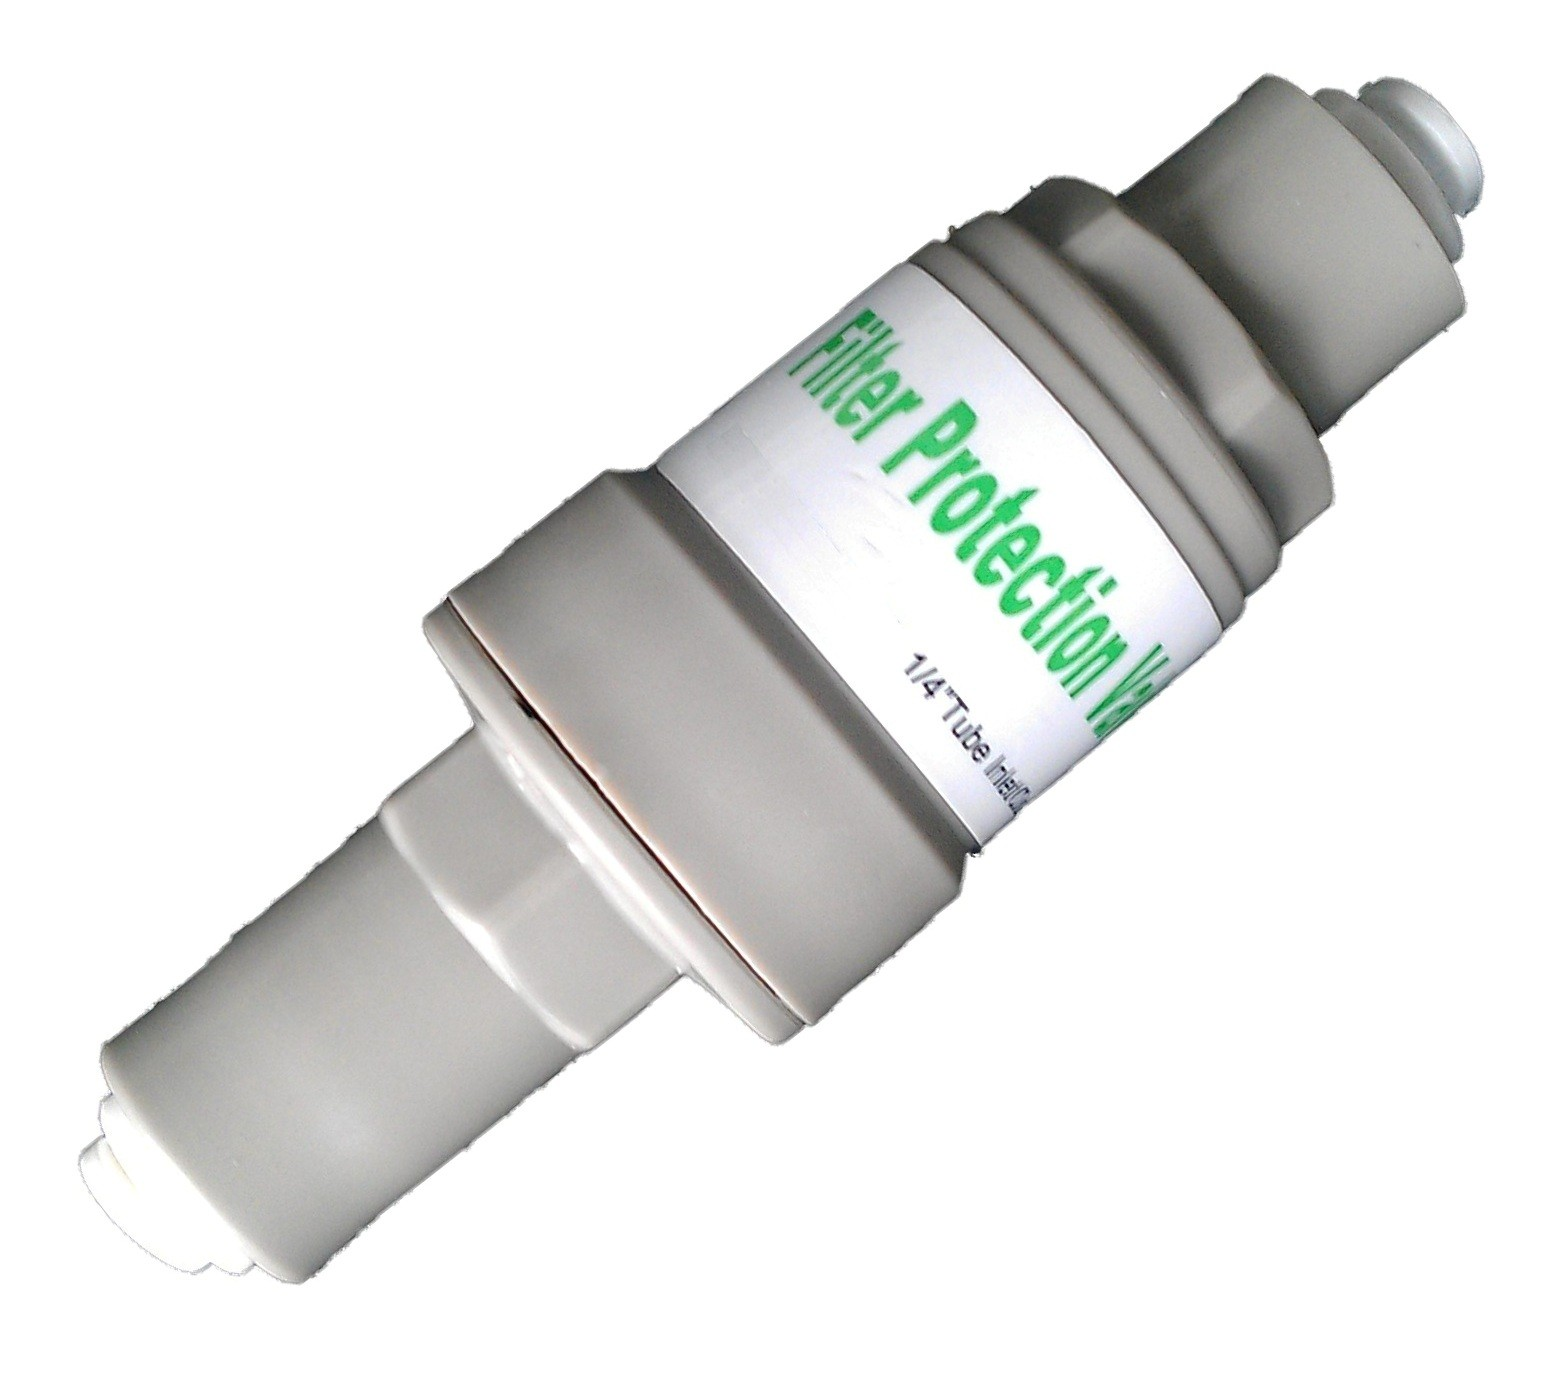 Fridge Filters Filter Protection Pressure Reducing Valve For Fridges Water